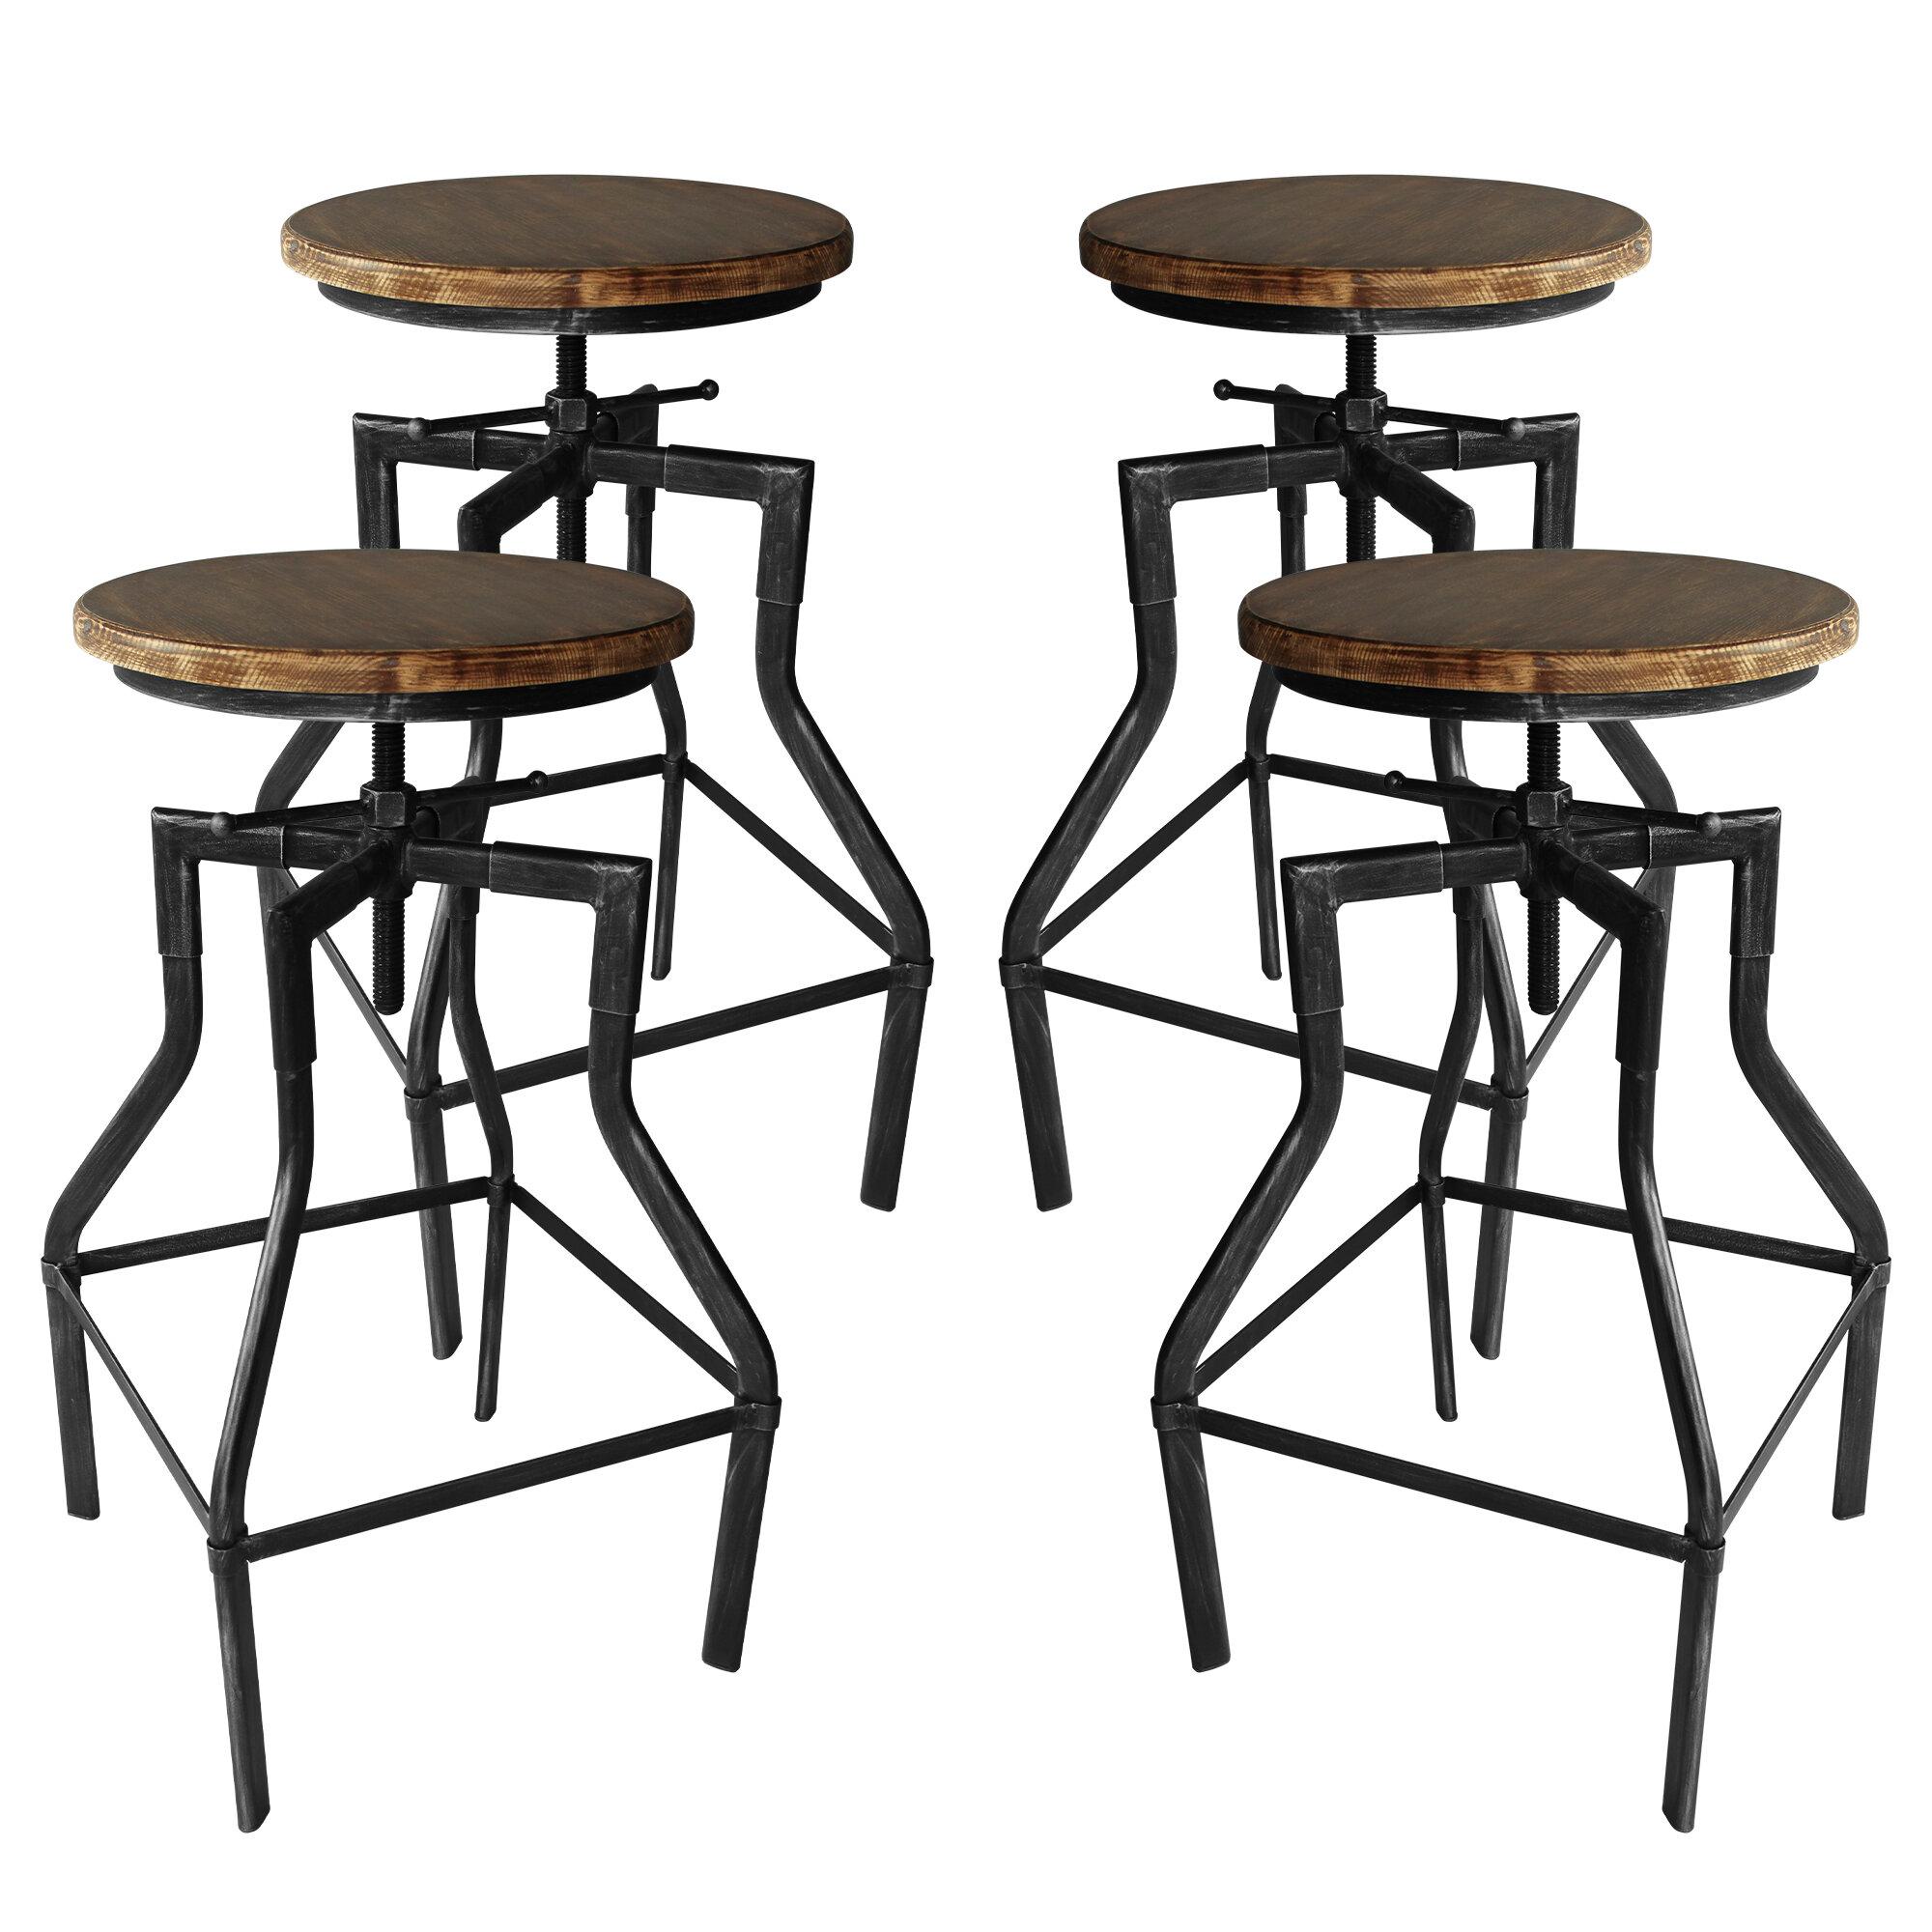 Astonishing Hogle Adjustable Height Bar Stool Set Of 4 Gamerscity Chair Design For Home Gamerscityorg